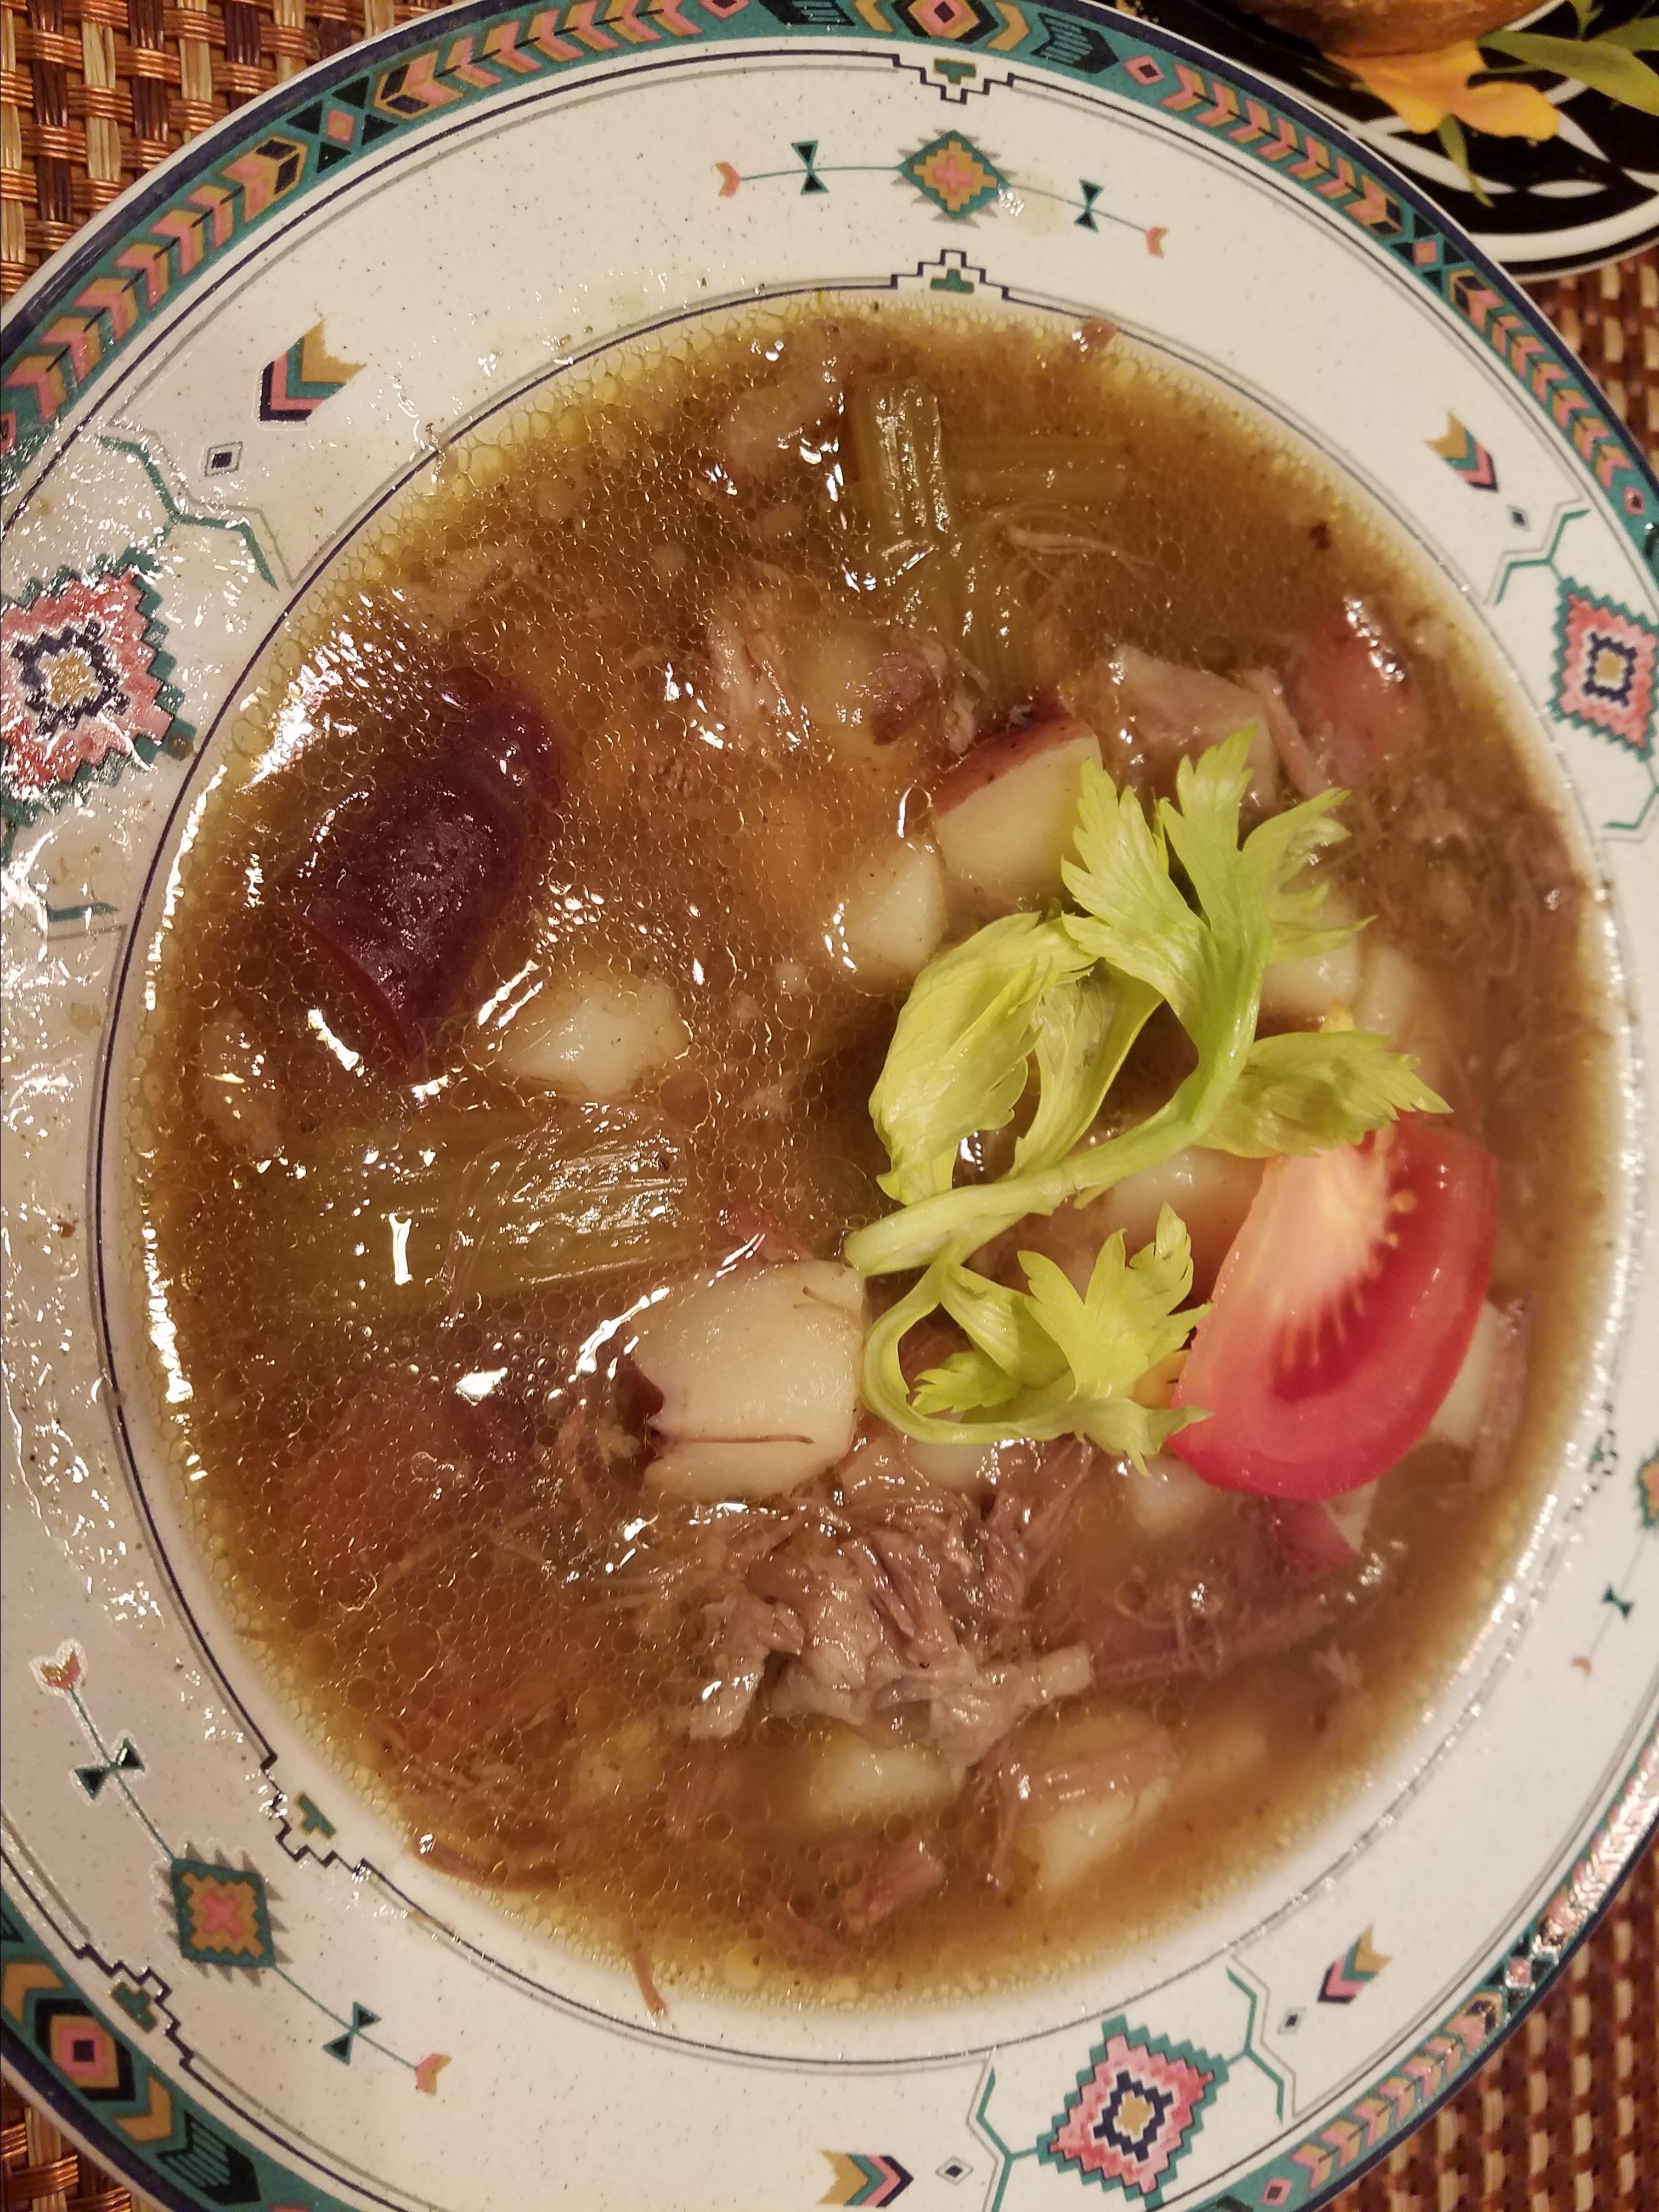 Sop Buntot (Indonesian Oxtail Soup)